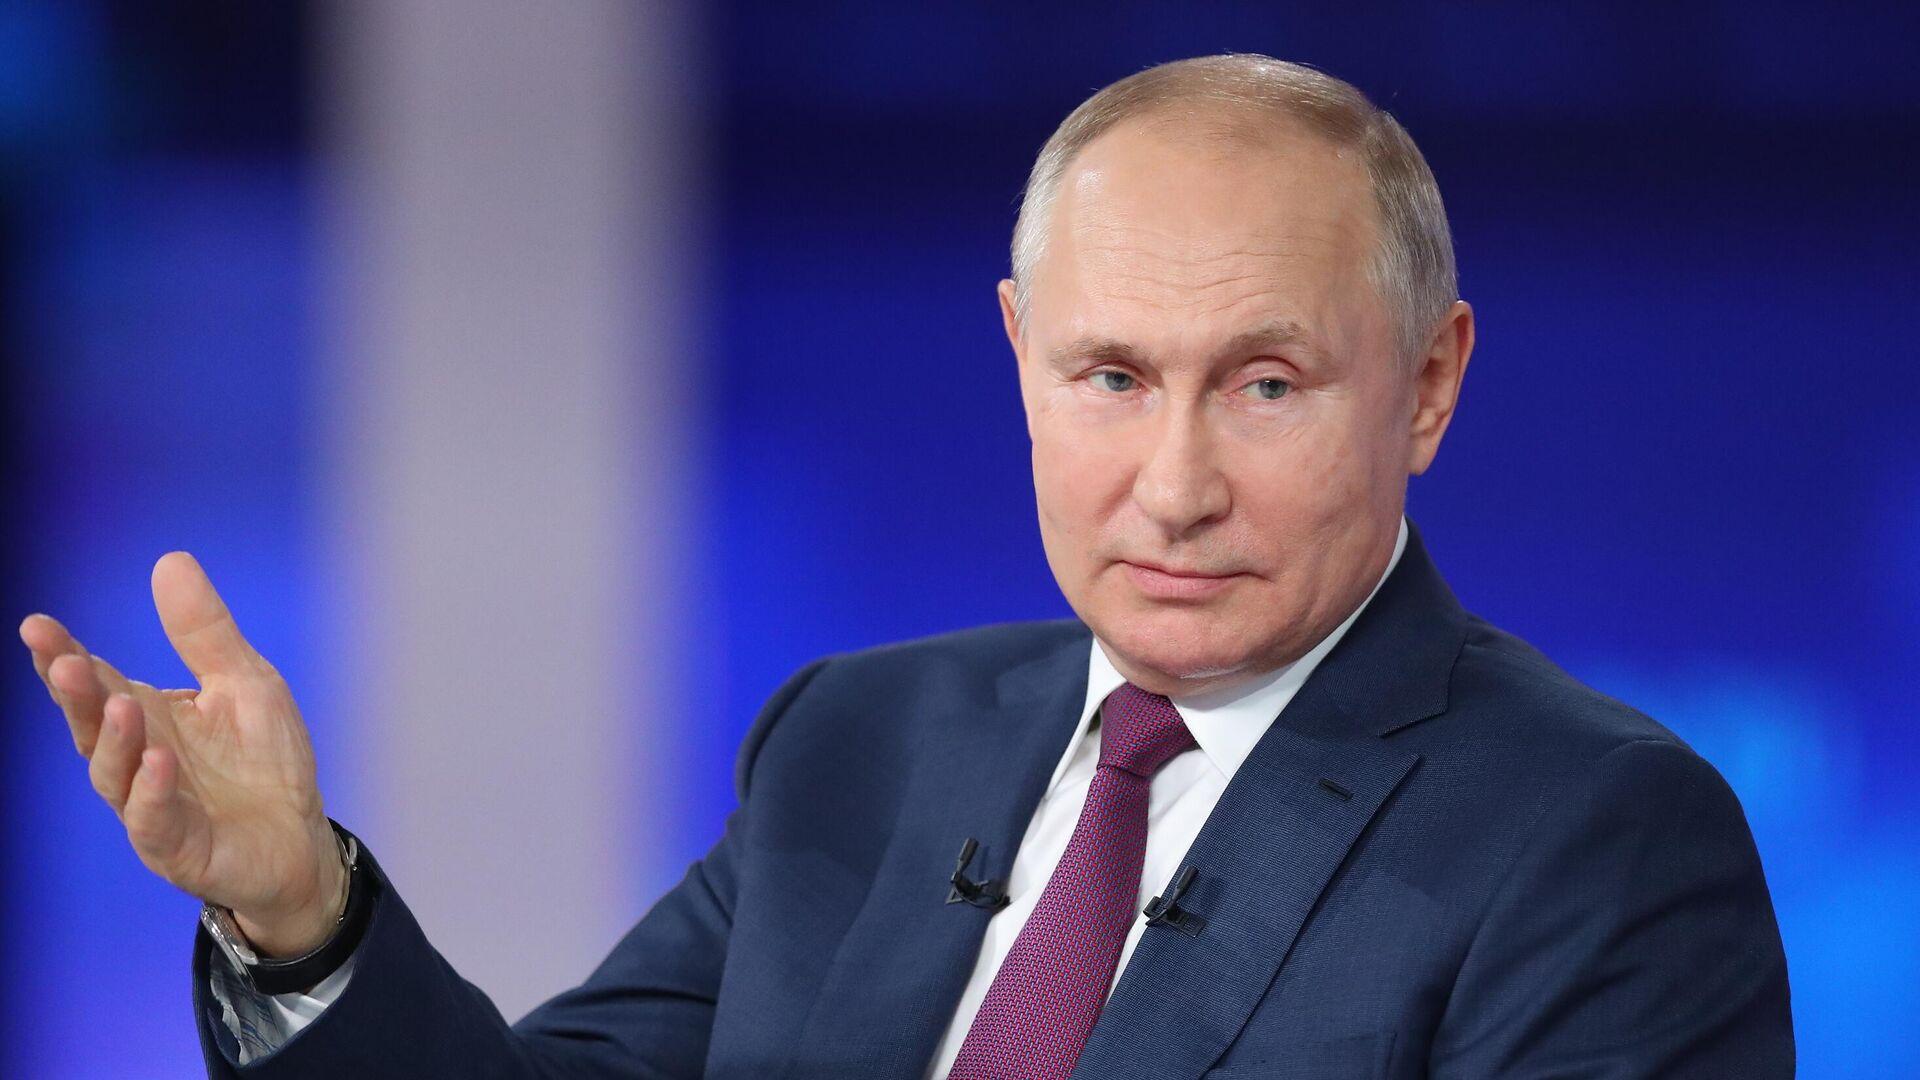 Línea directa con Vladímir Putin 2021 - Sputnik Mundo, 1920, 12.08.2021